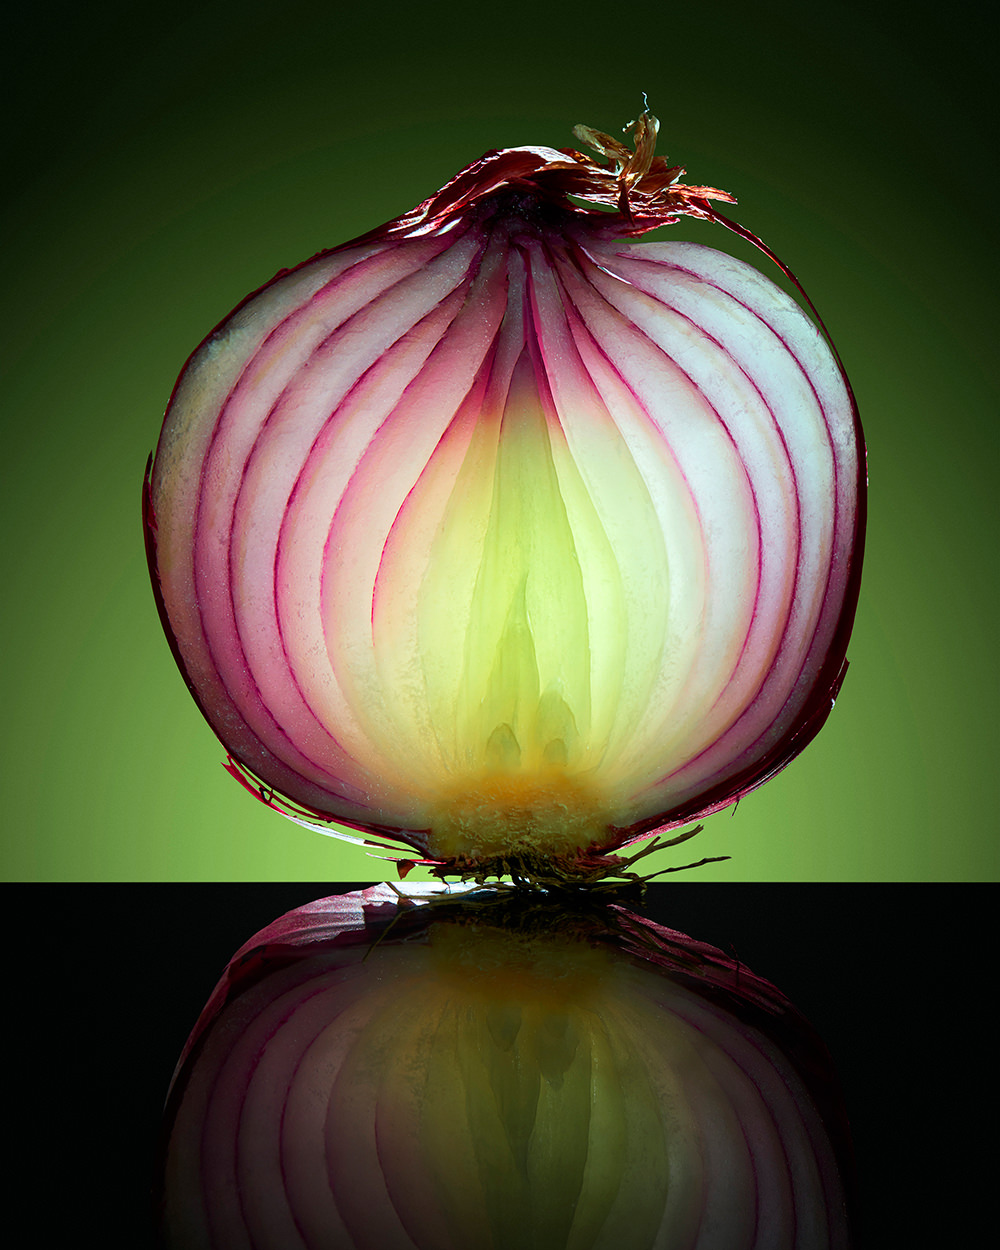 macro red onion texture studio photography